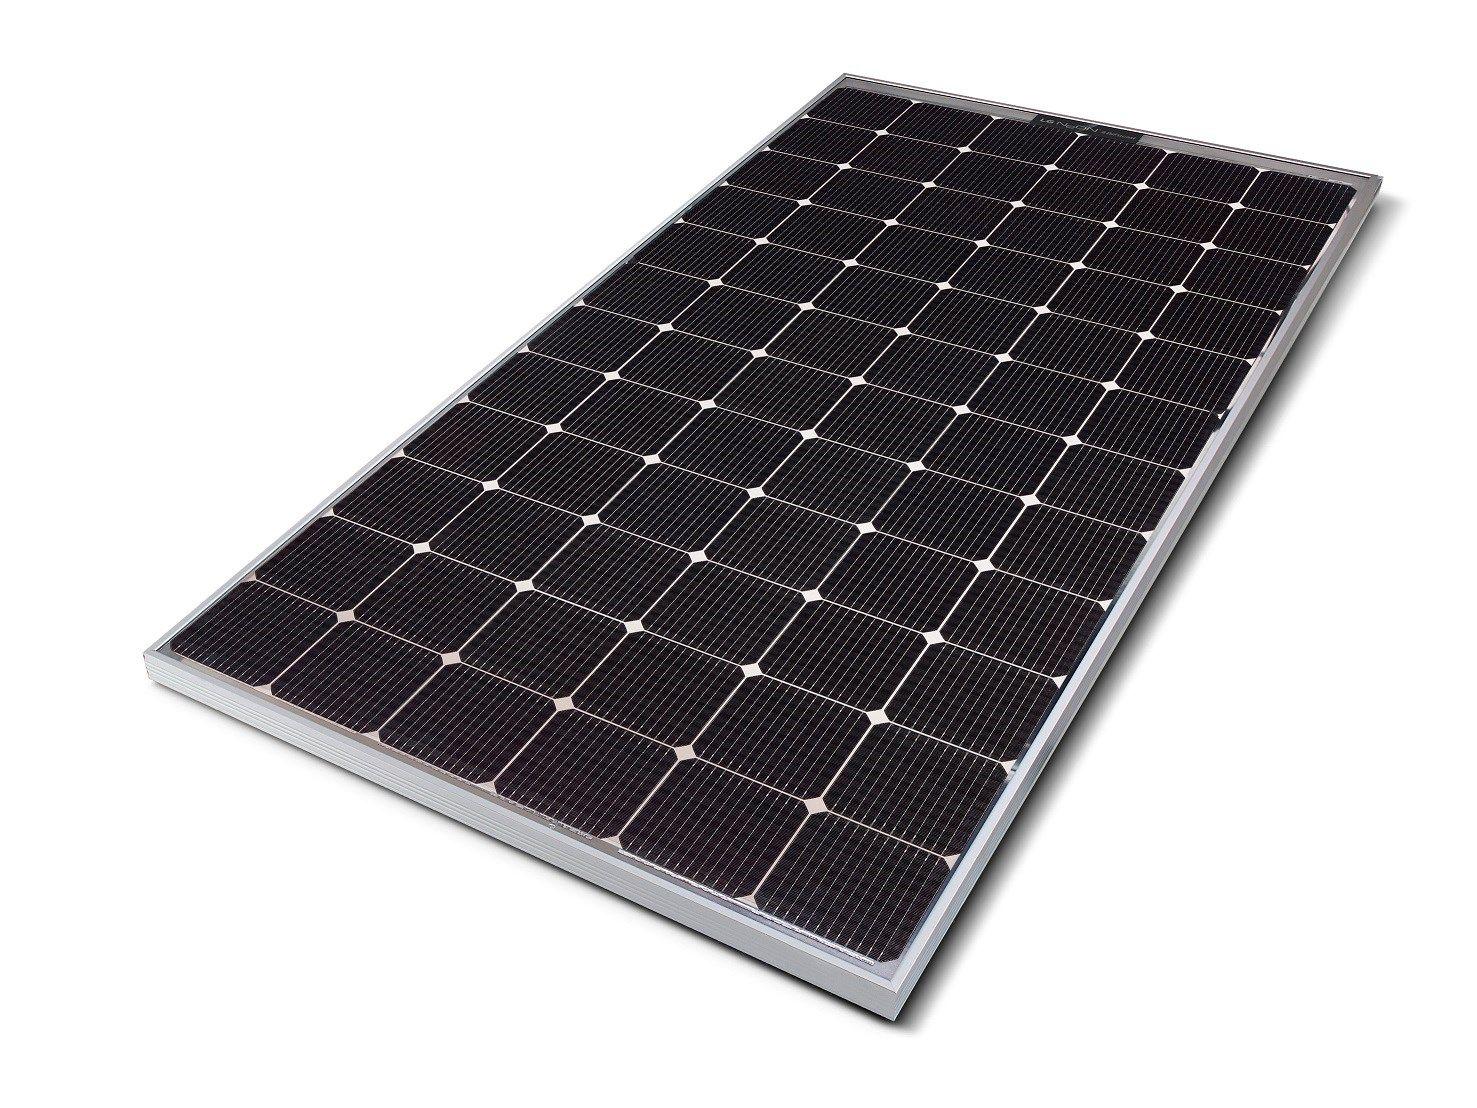 LG Electronics migliora l'efficienza energetica di una villetta e apre al Superbonus 110%